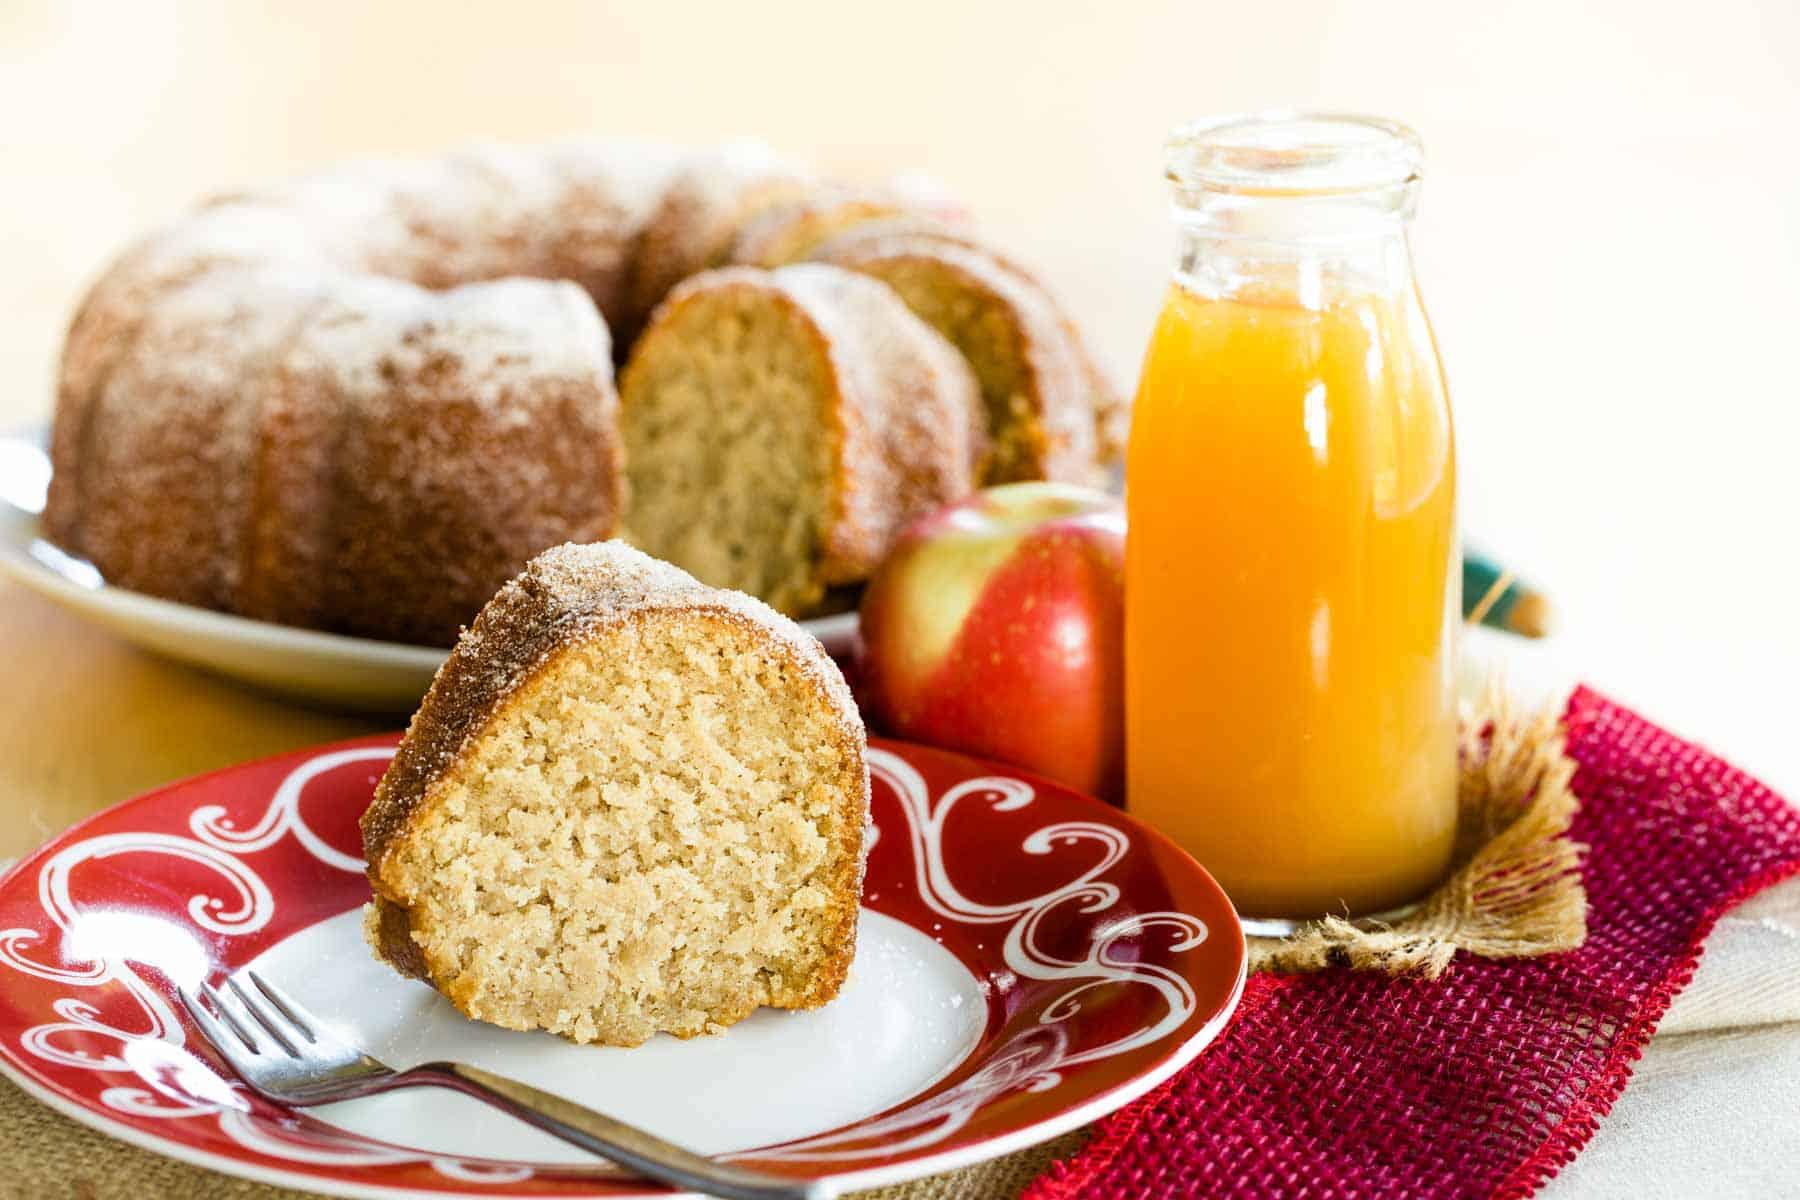 Gluten free apple cinnamon bundt cake with a slice in front